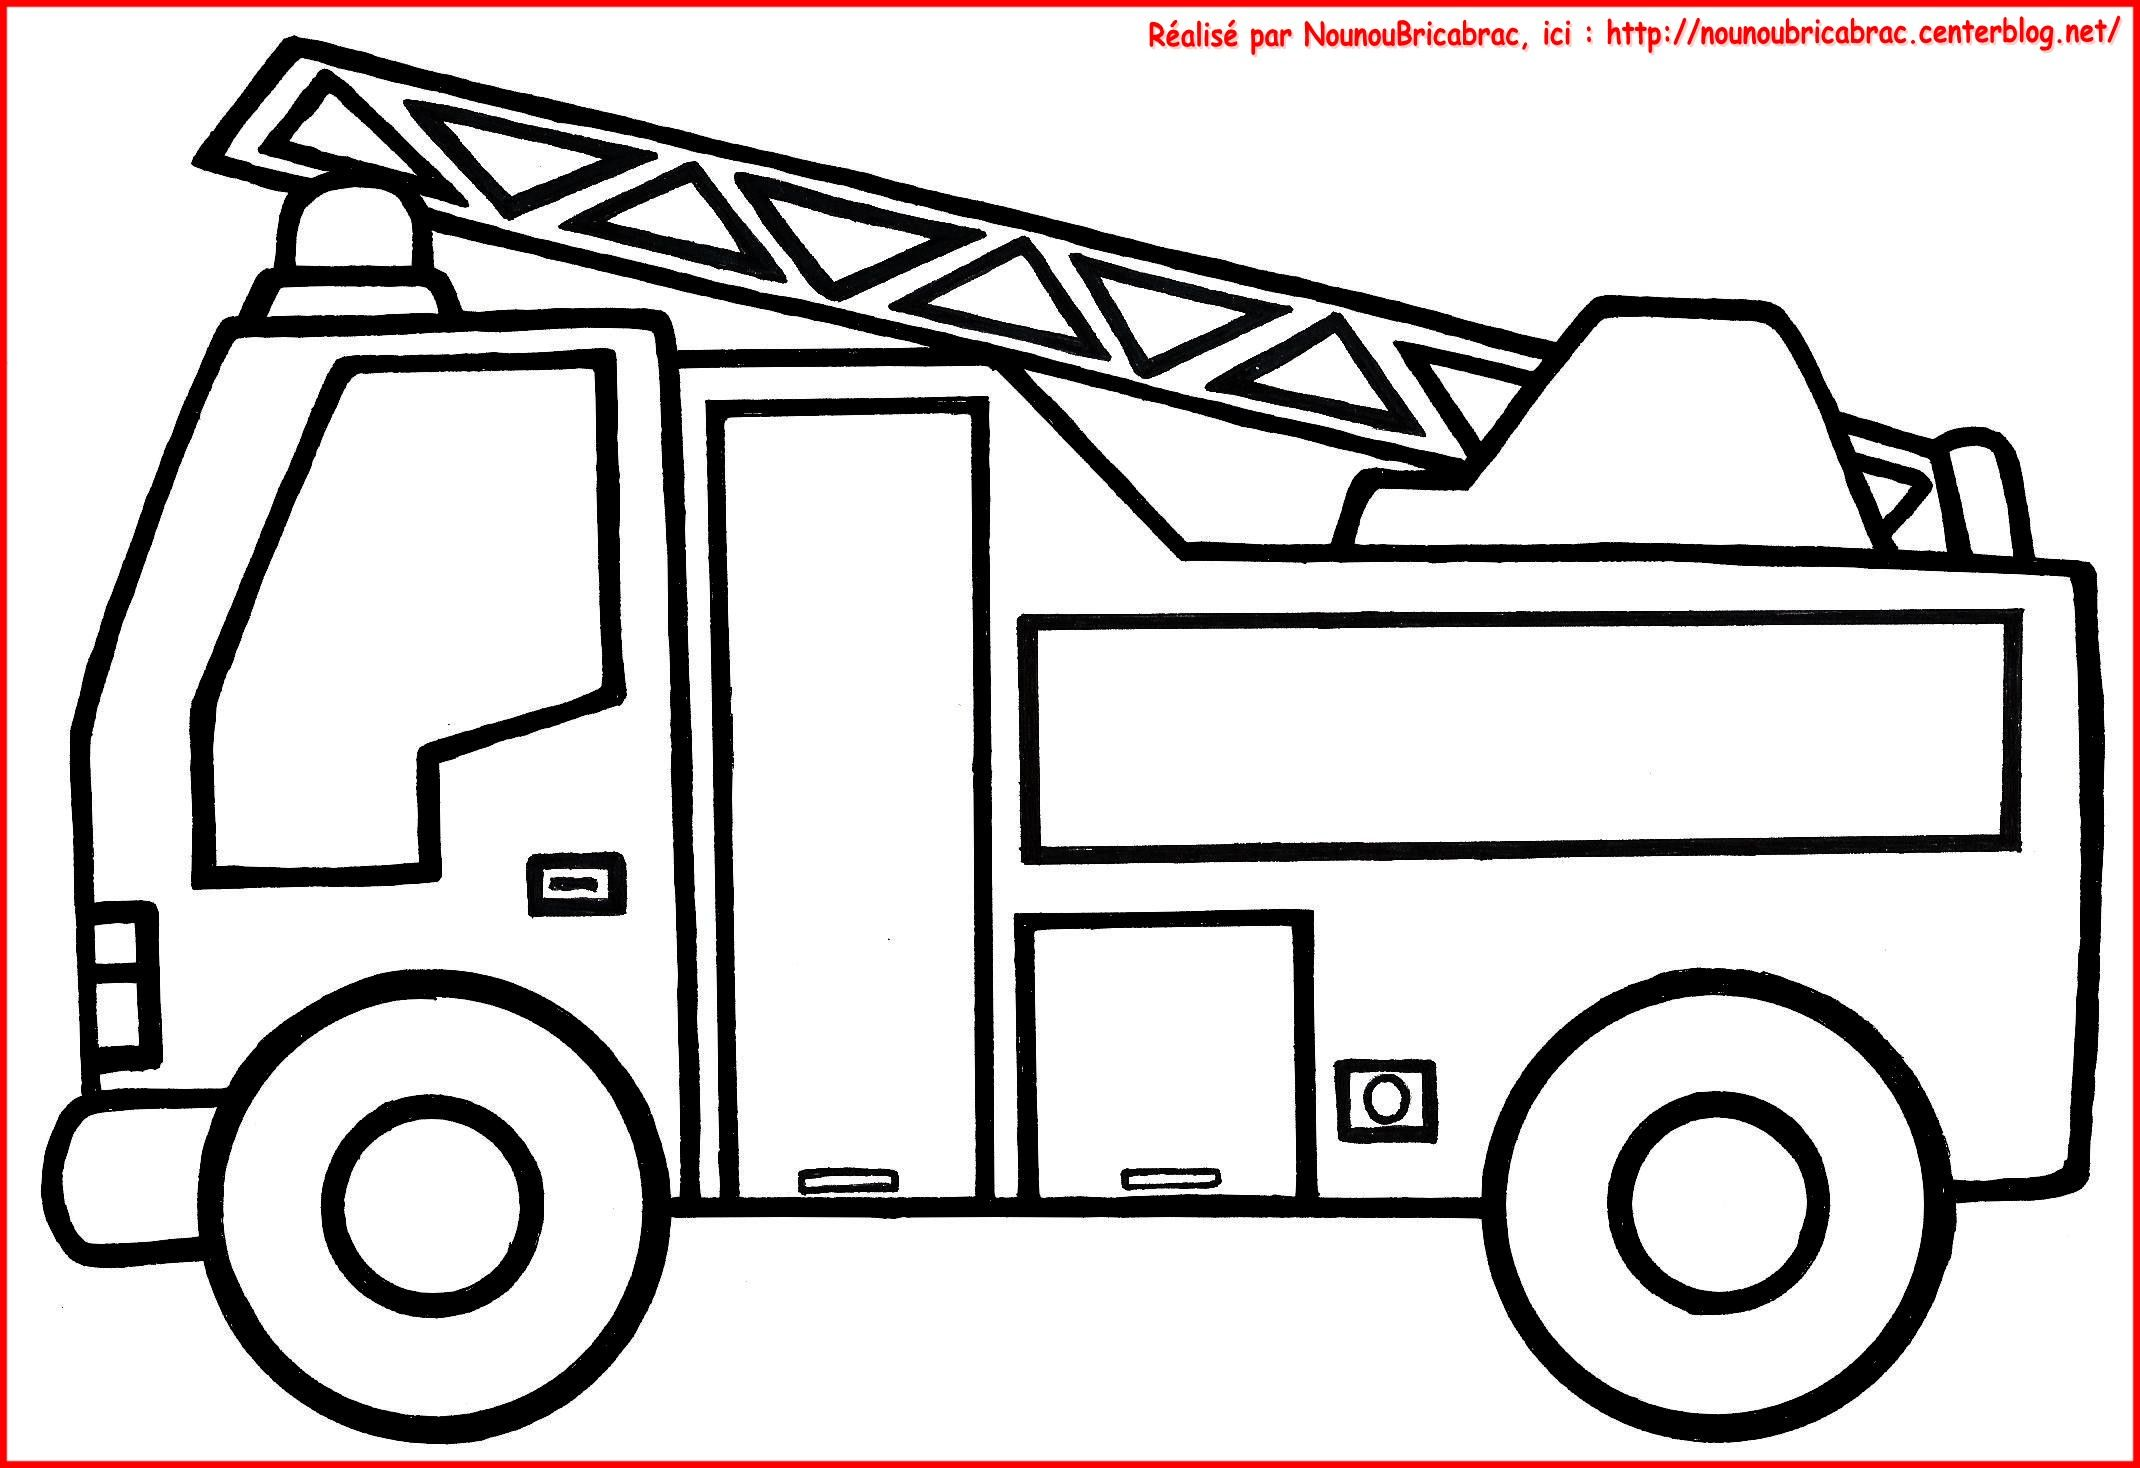 Feuerwehr Ausmalbilder Kindergarten : Camion De Pompier Colorier Feuerwehr Bilder Feuerwehr Und